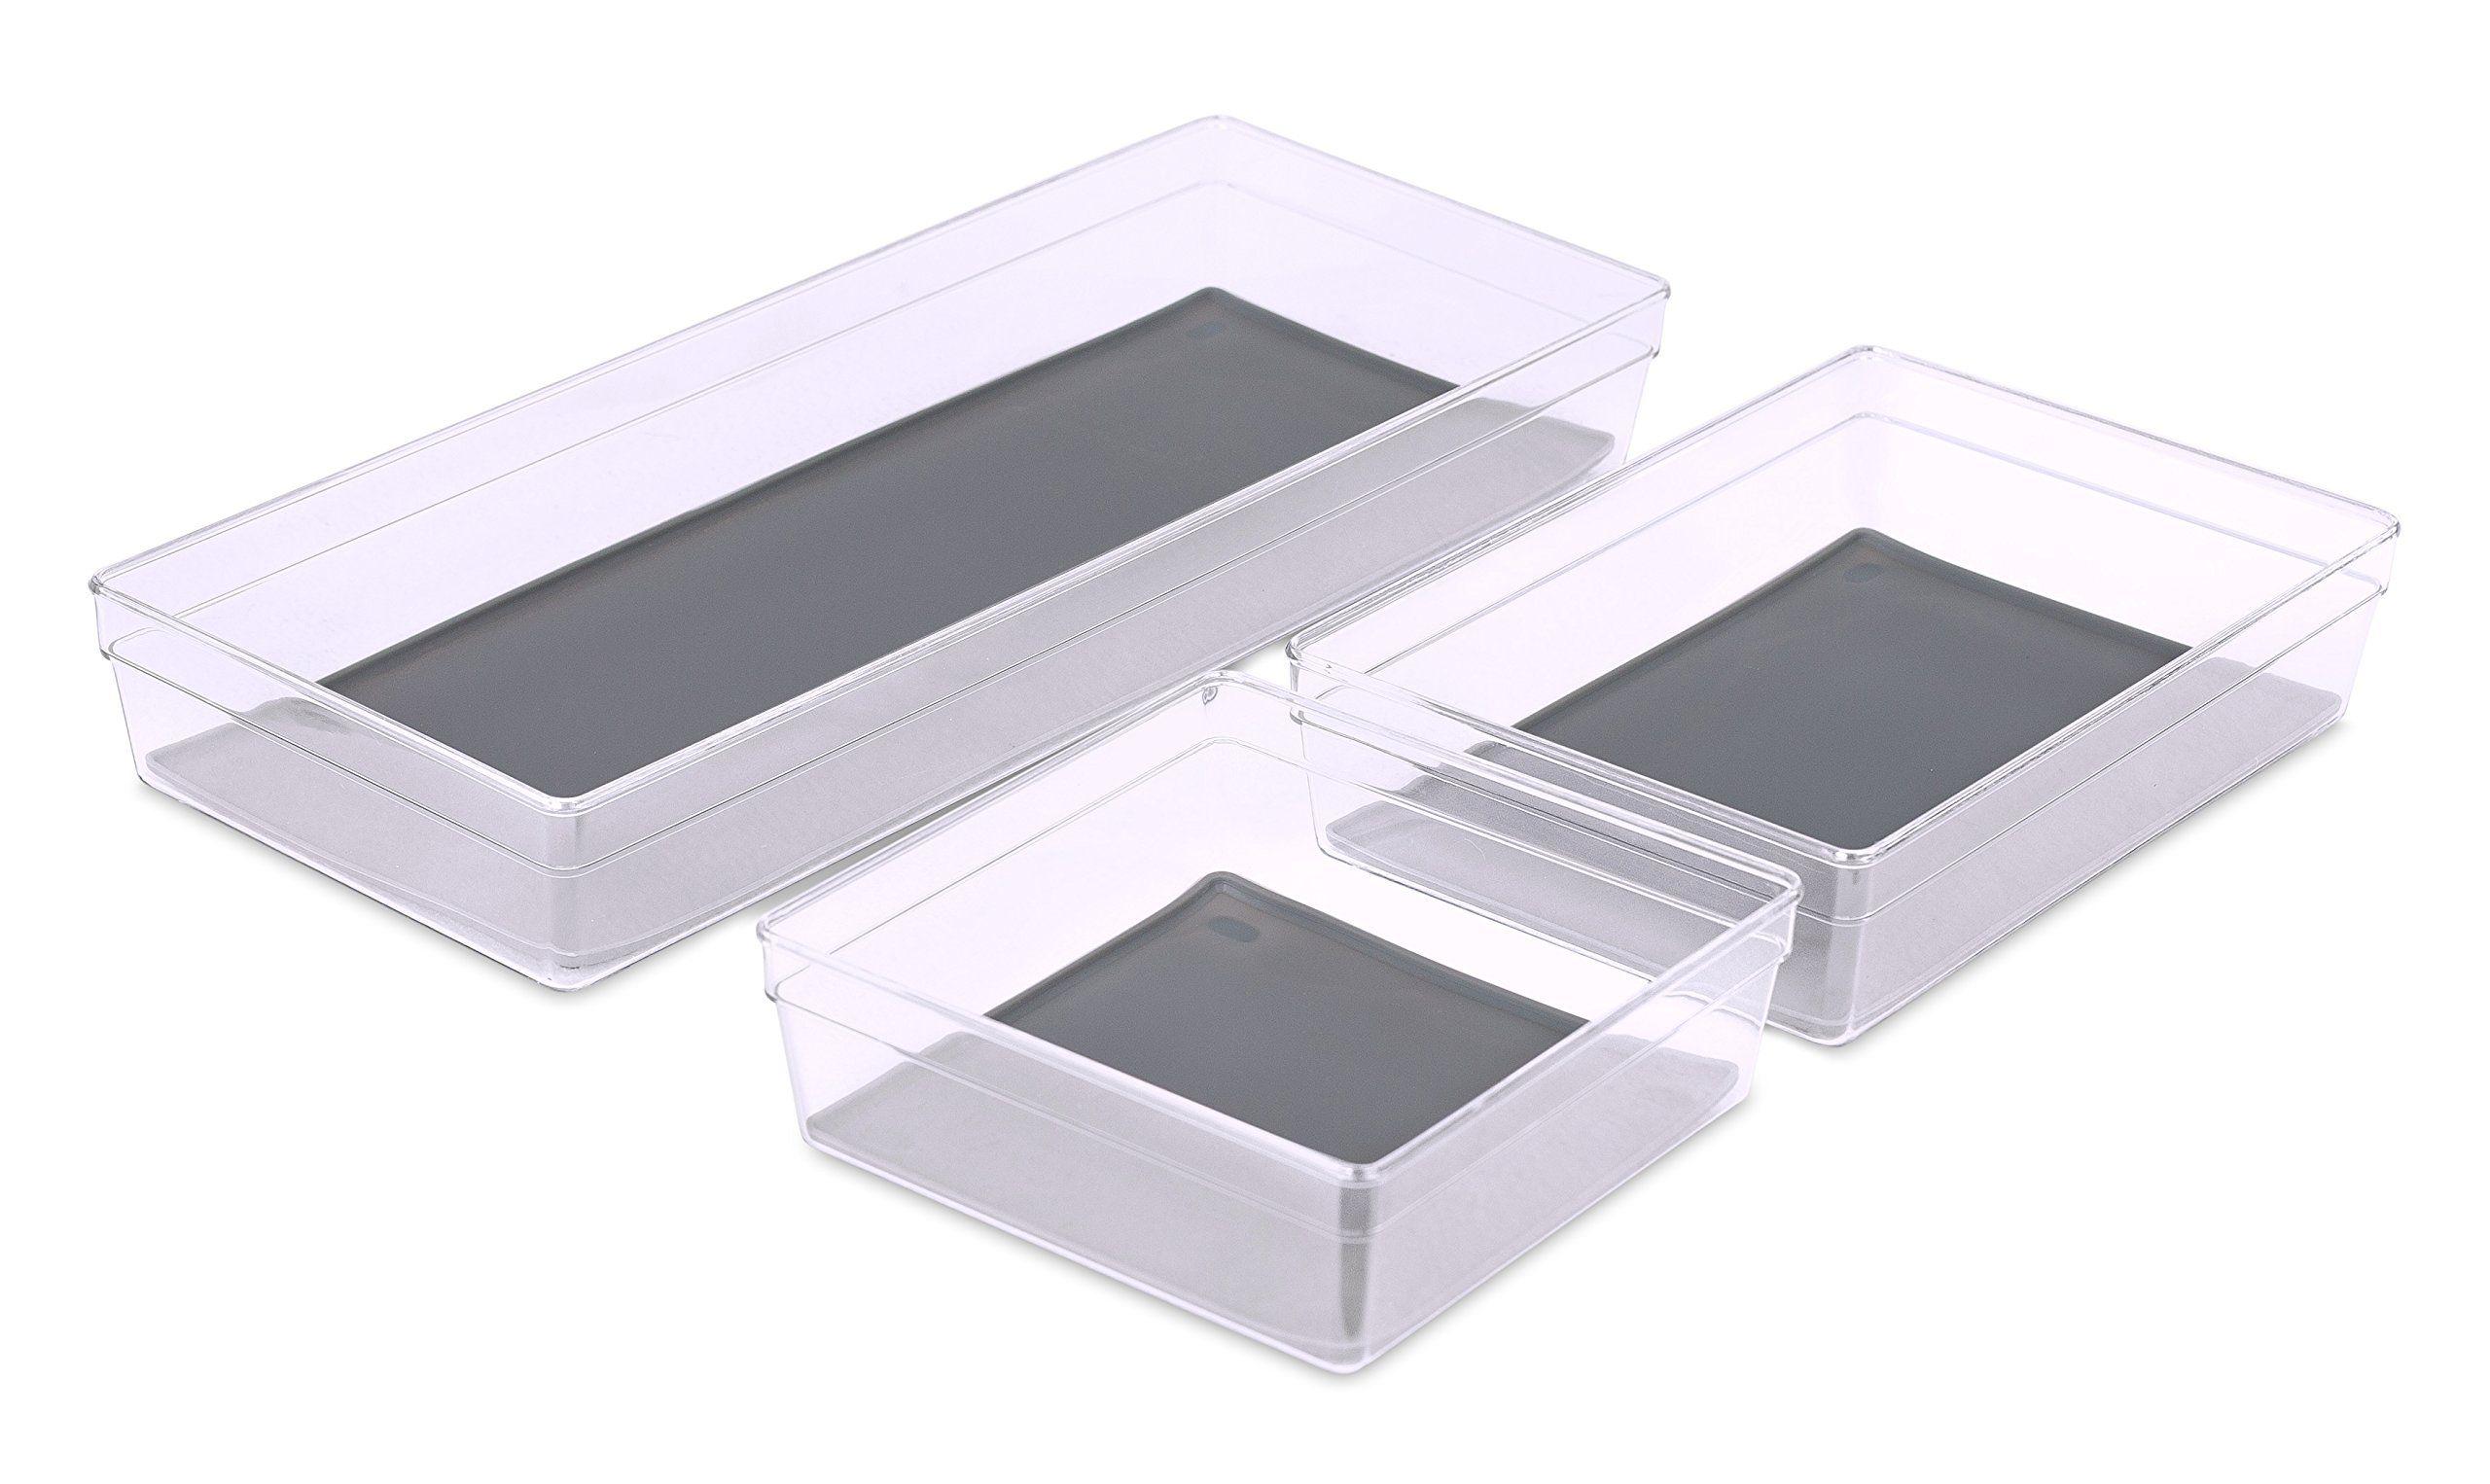 Internet S Best Kitchen Drawer Organizer Tray Set Of 3 Acrylic Plastic Storage Plastic Container Storage Kitchen Drawer Organization Small Bathroom Renovations